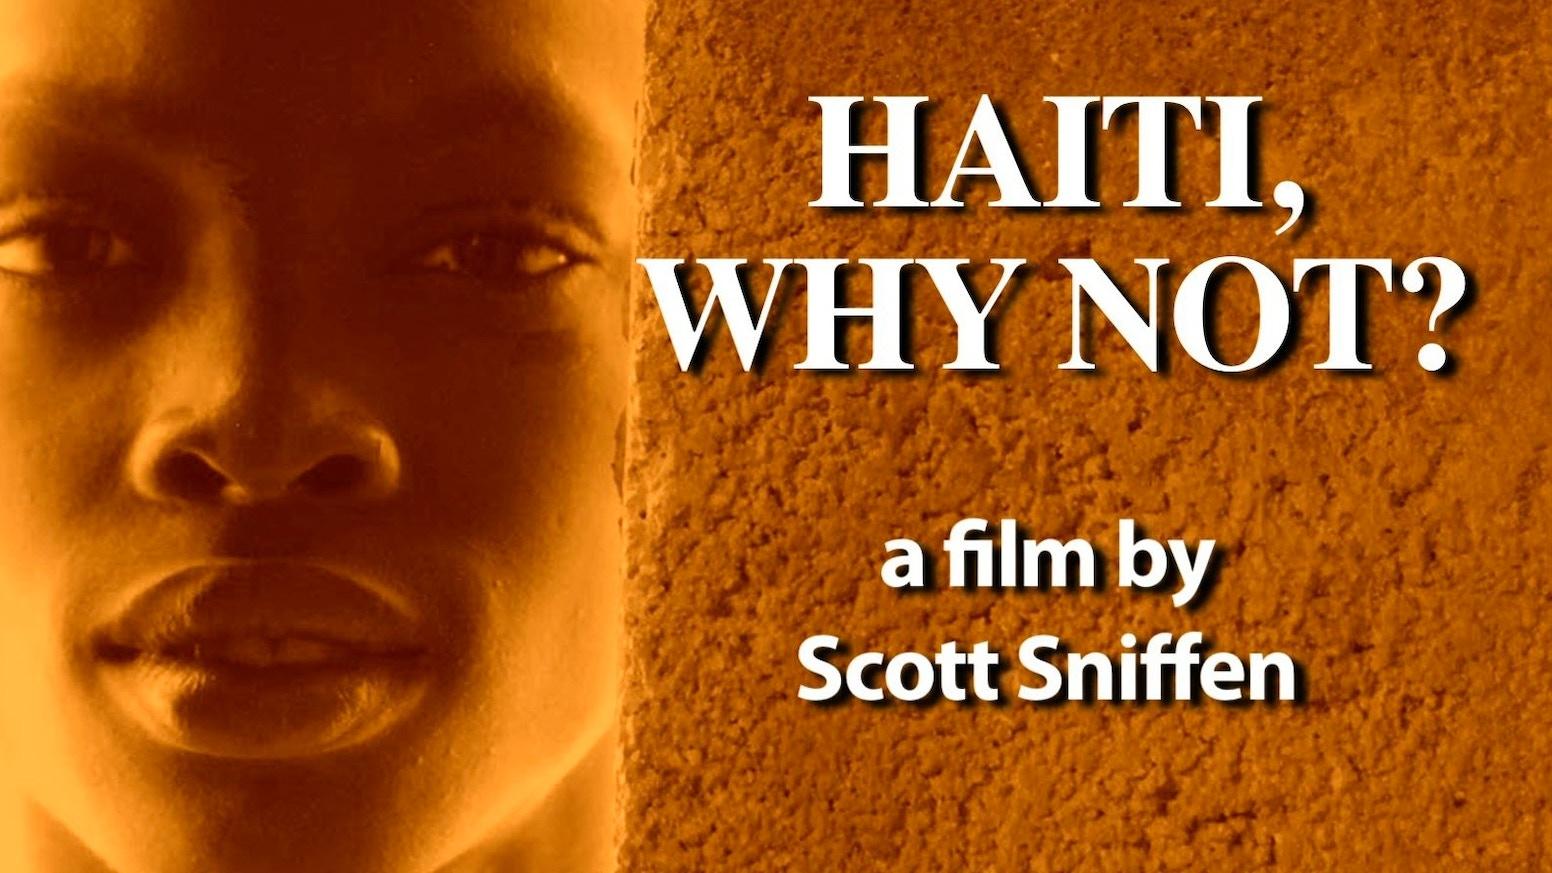 Haiti, Why Not? By Scott Sniffen